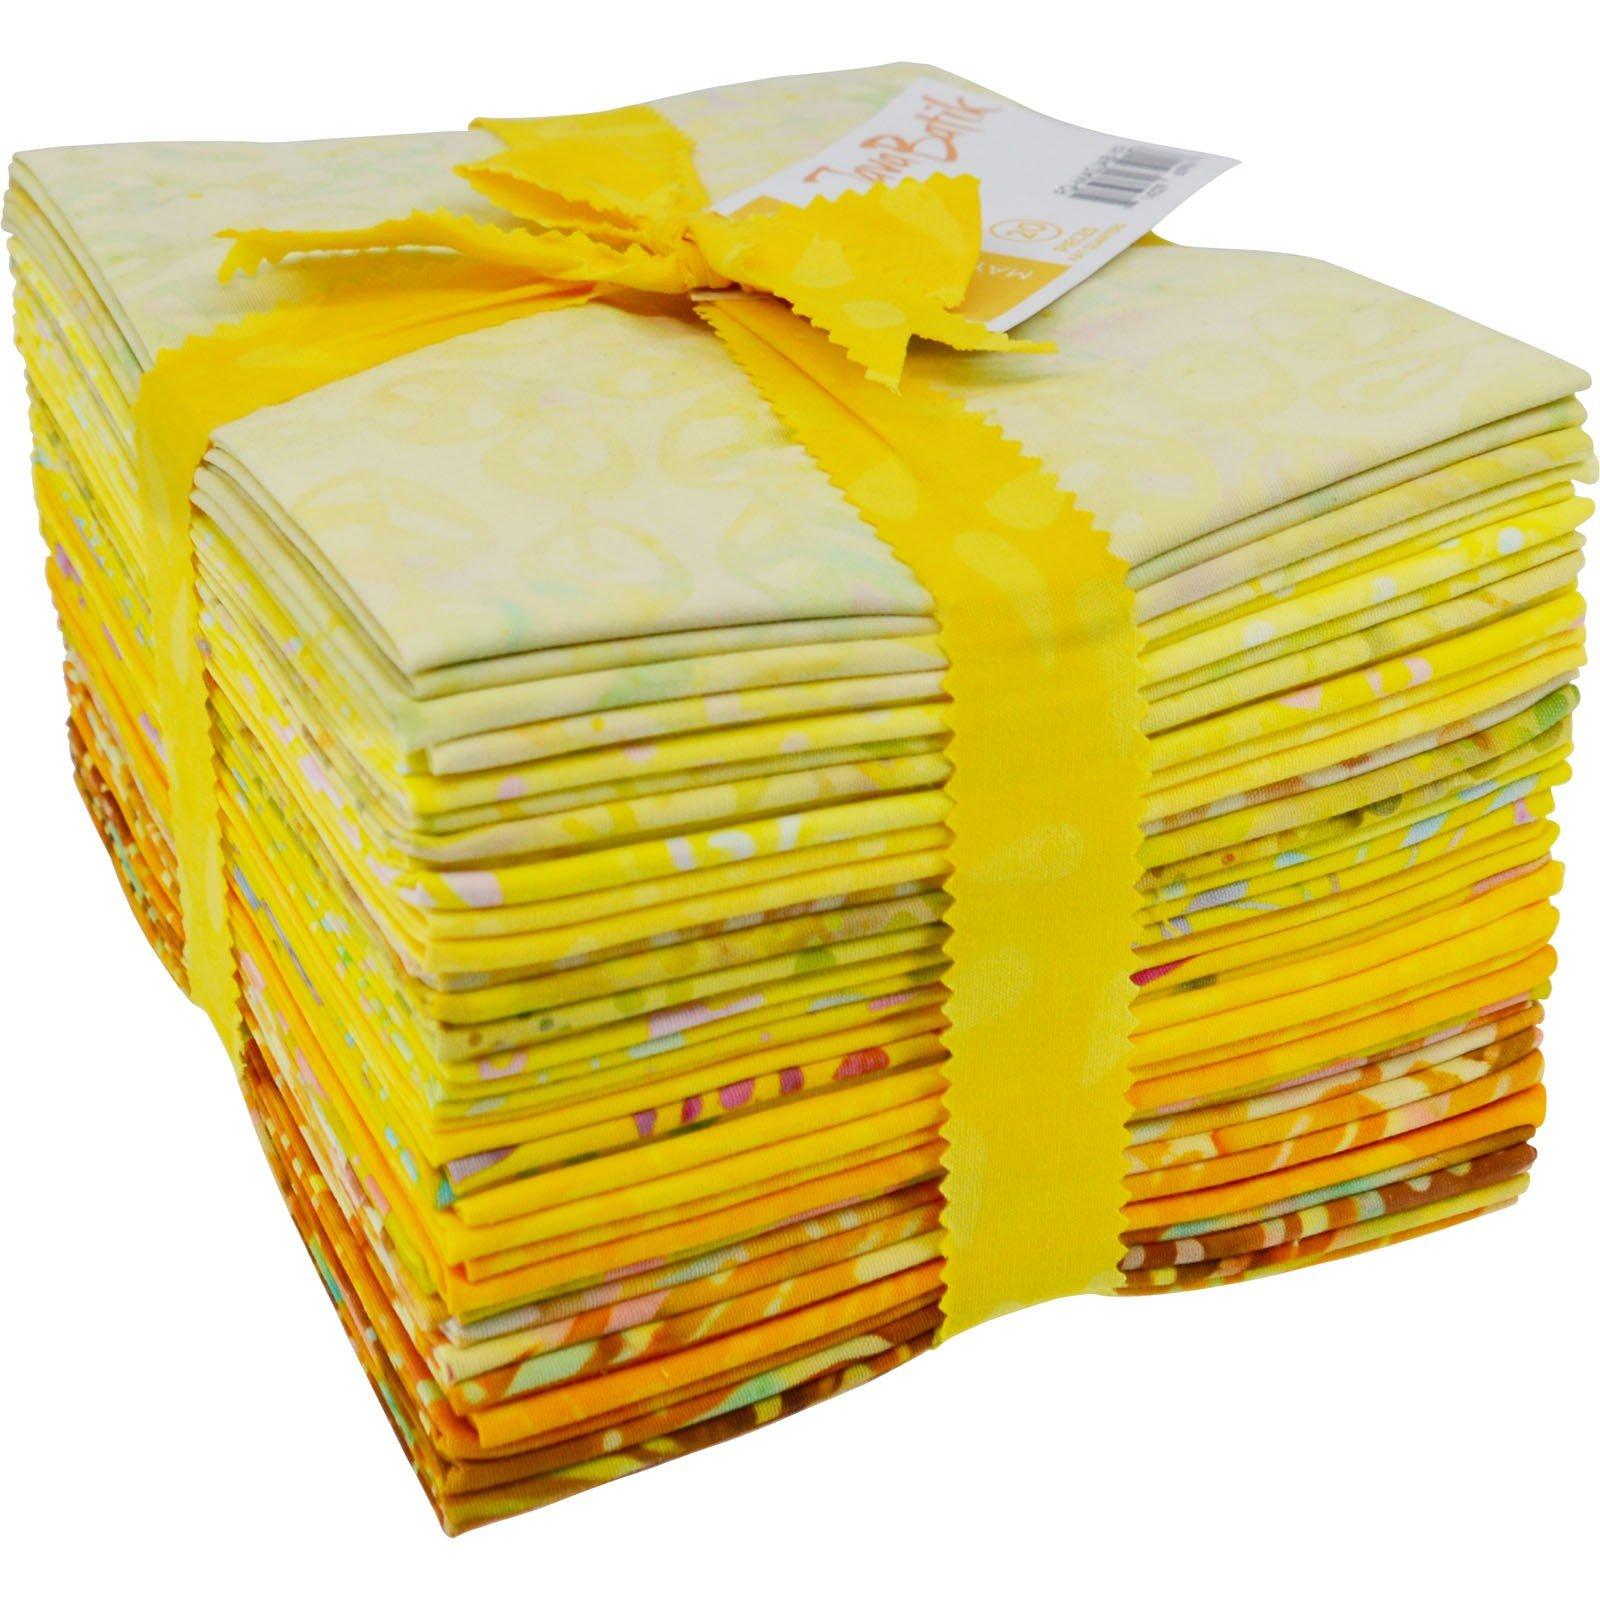 Maywood Java Batiks YELLOW Prints Bundles Fat Quarters (20)